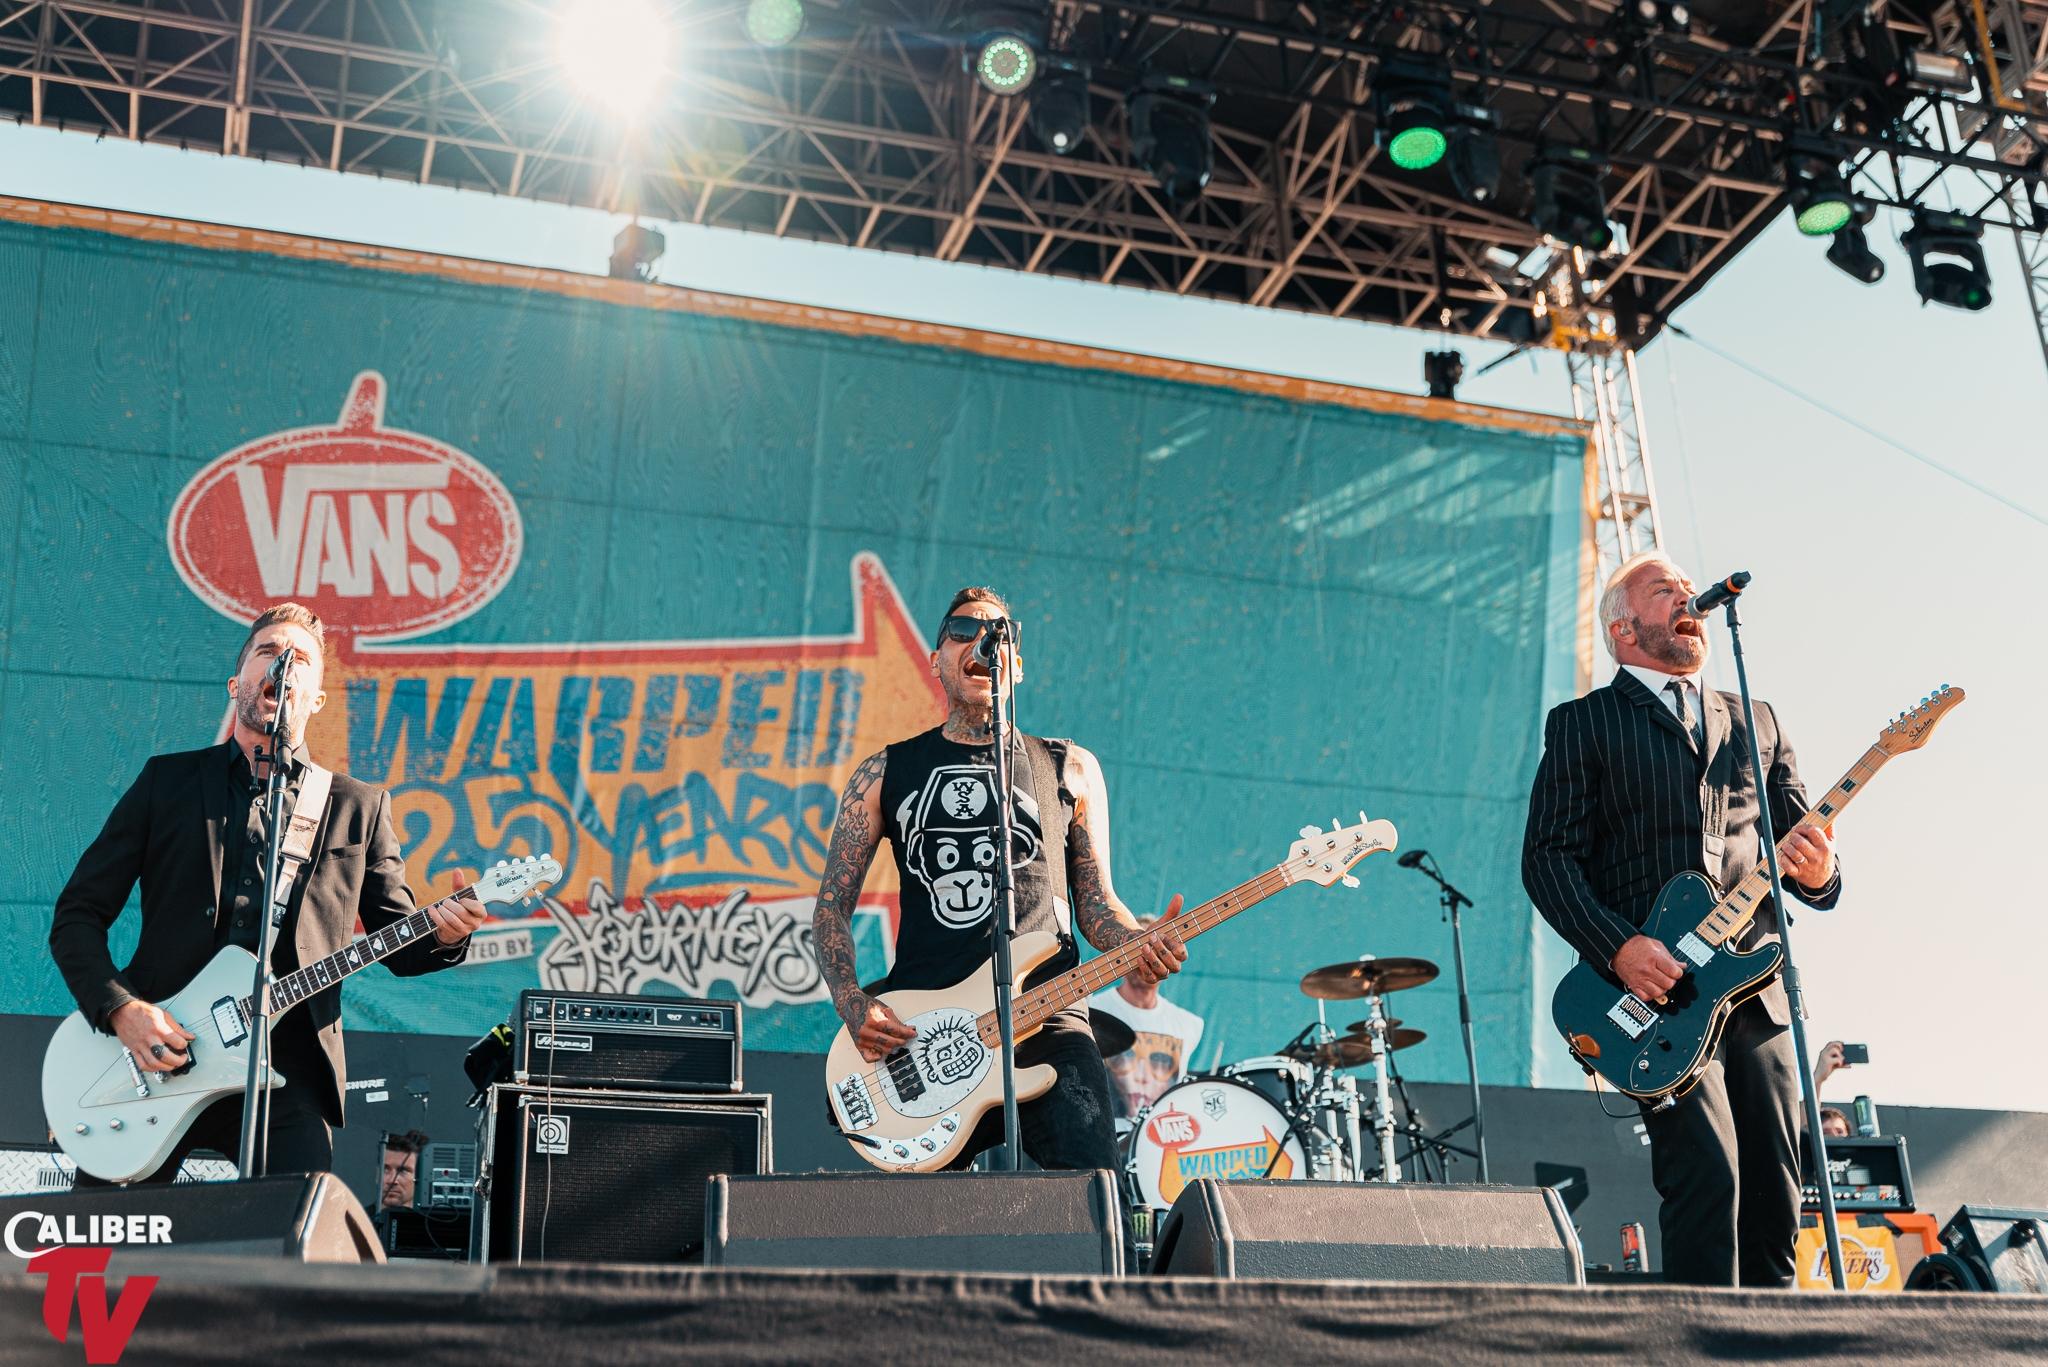 Vans Warped Tour 25th Anniversary (Day 1) – Mountain View, CA – 7.20.19